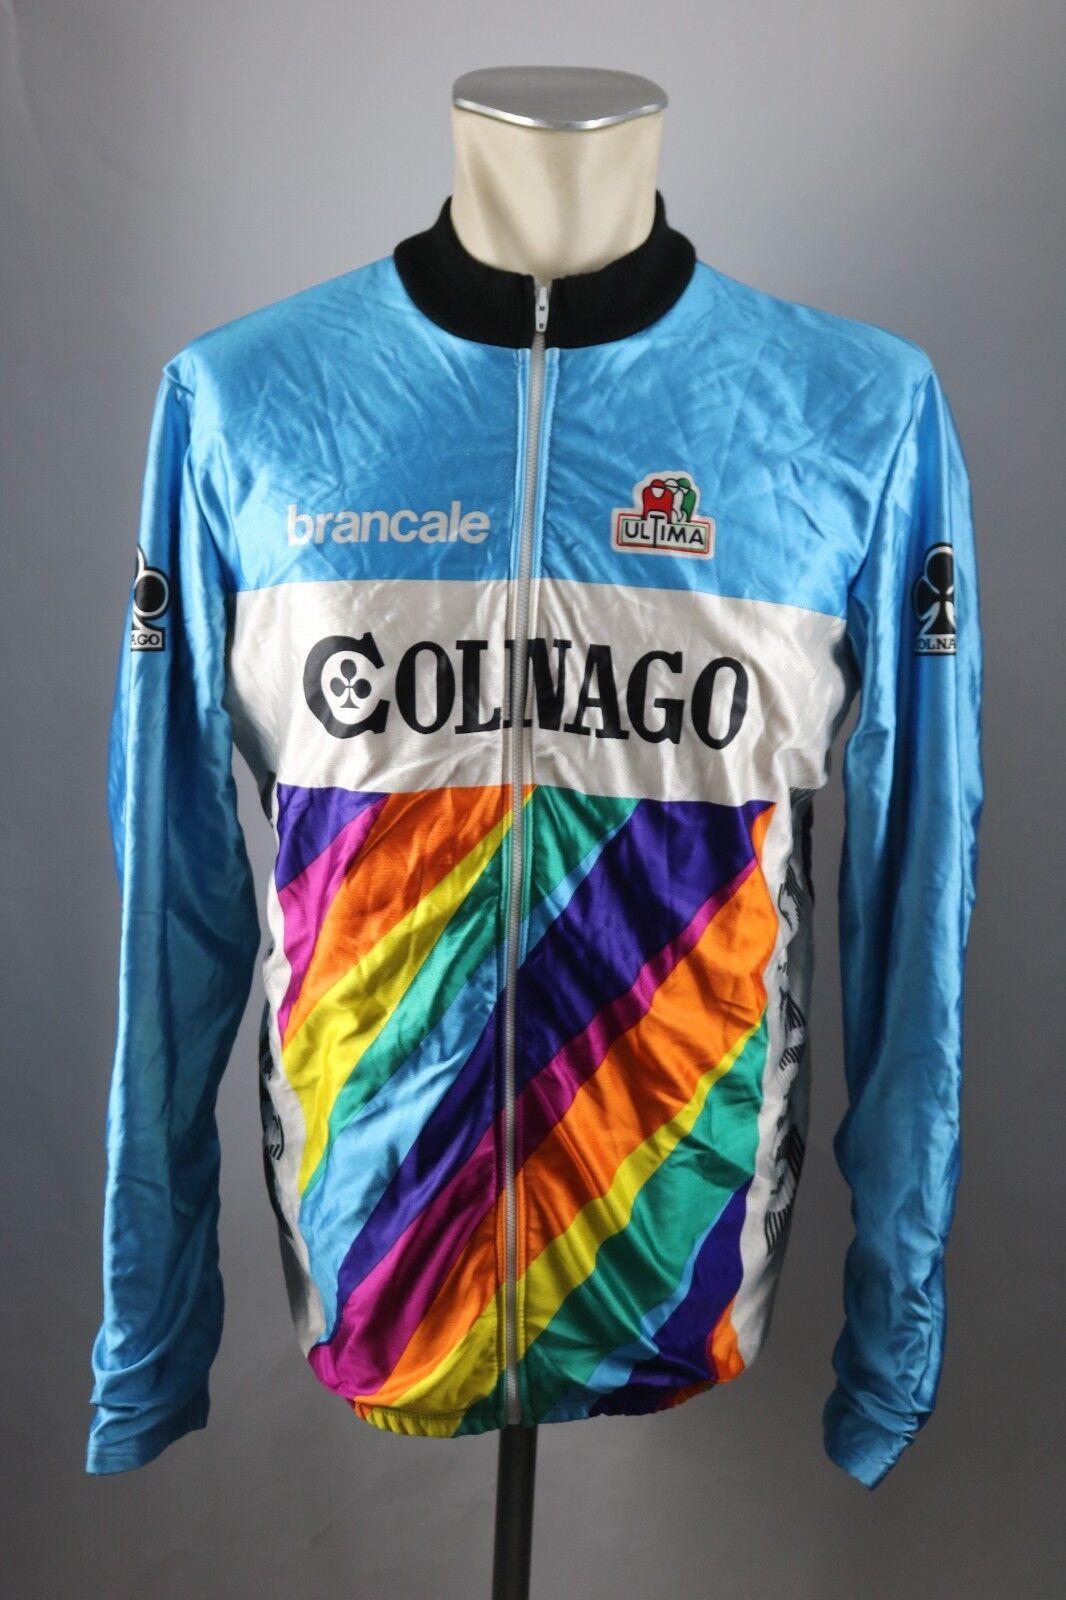 Ultima vintage brancale Colnago Jacke Gr. 6 BW 57  Bike cycling jacket Shirt S5